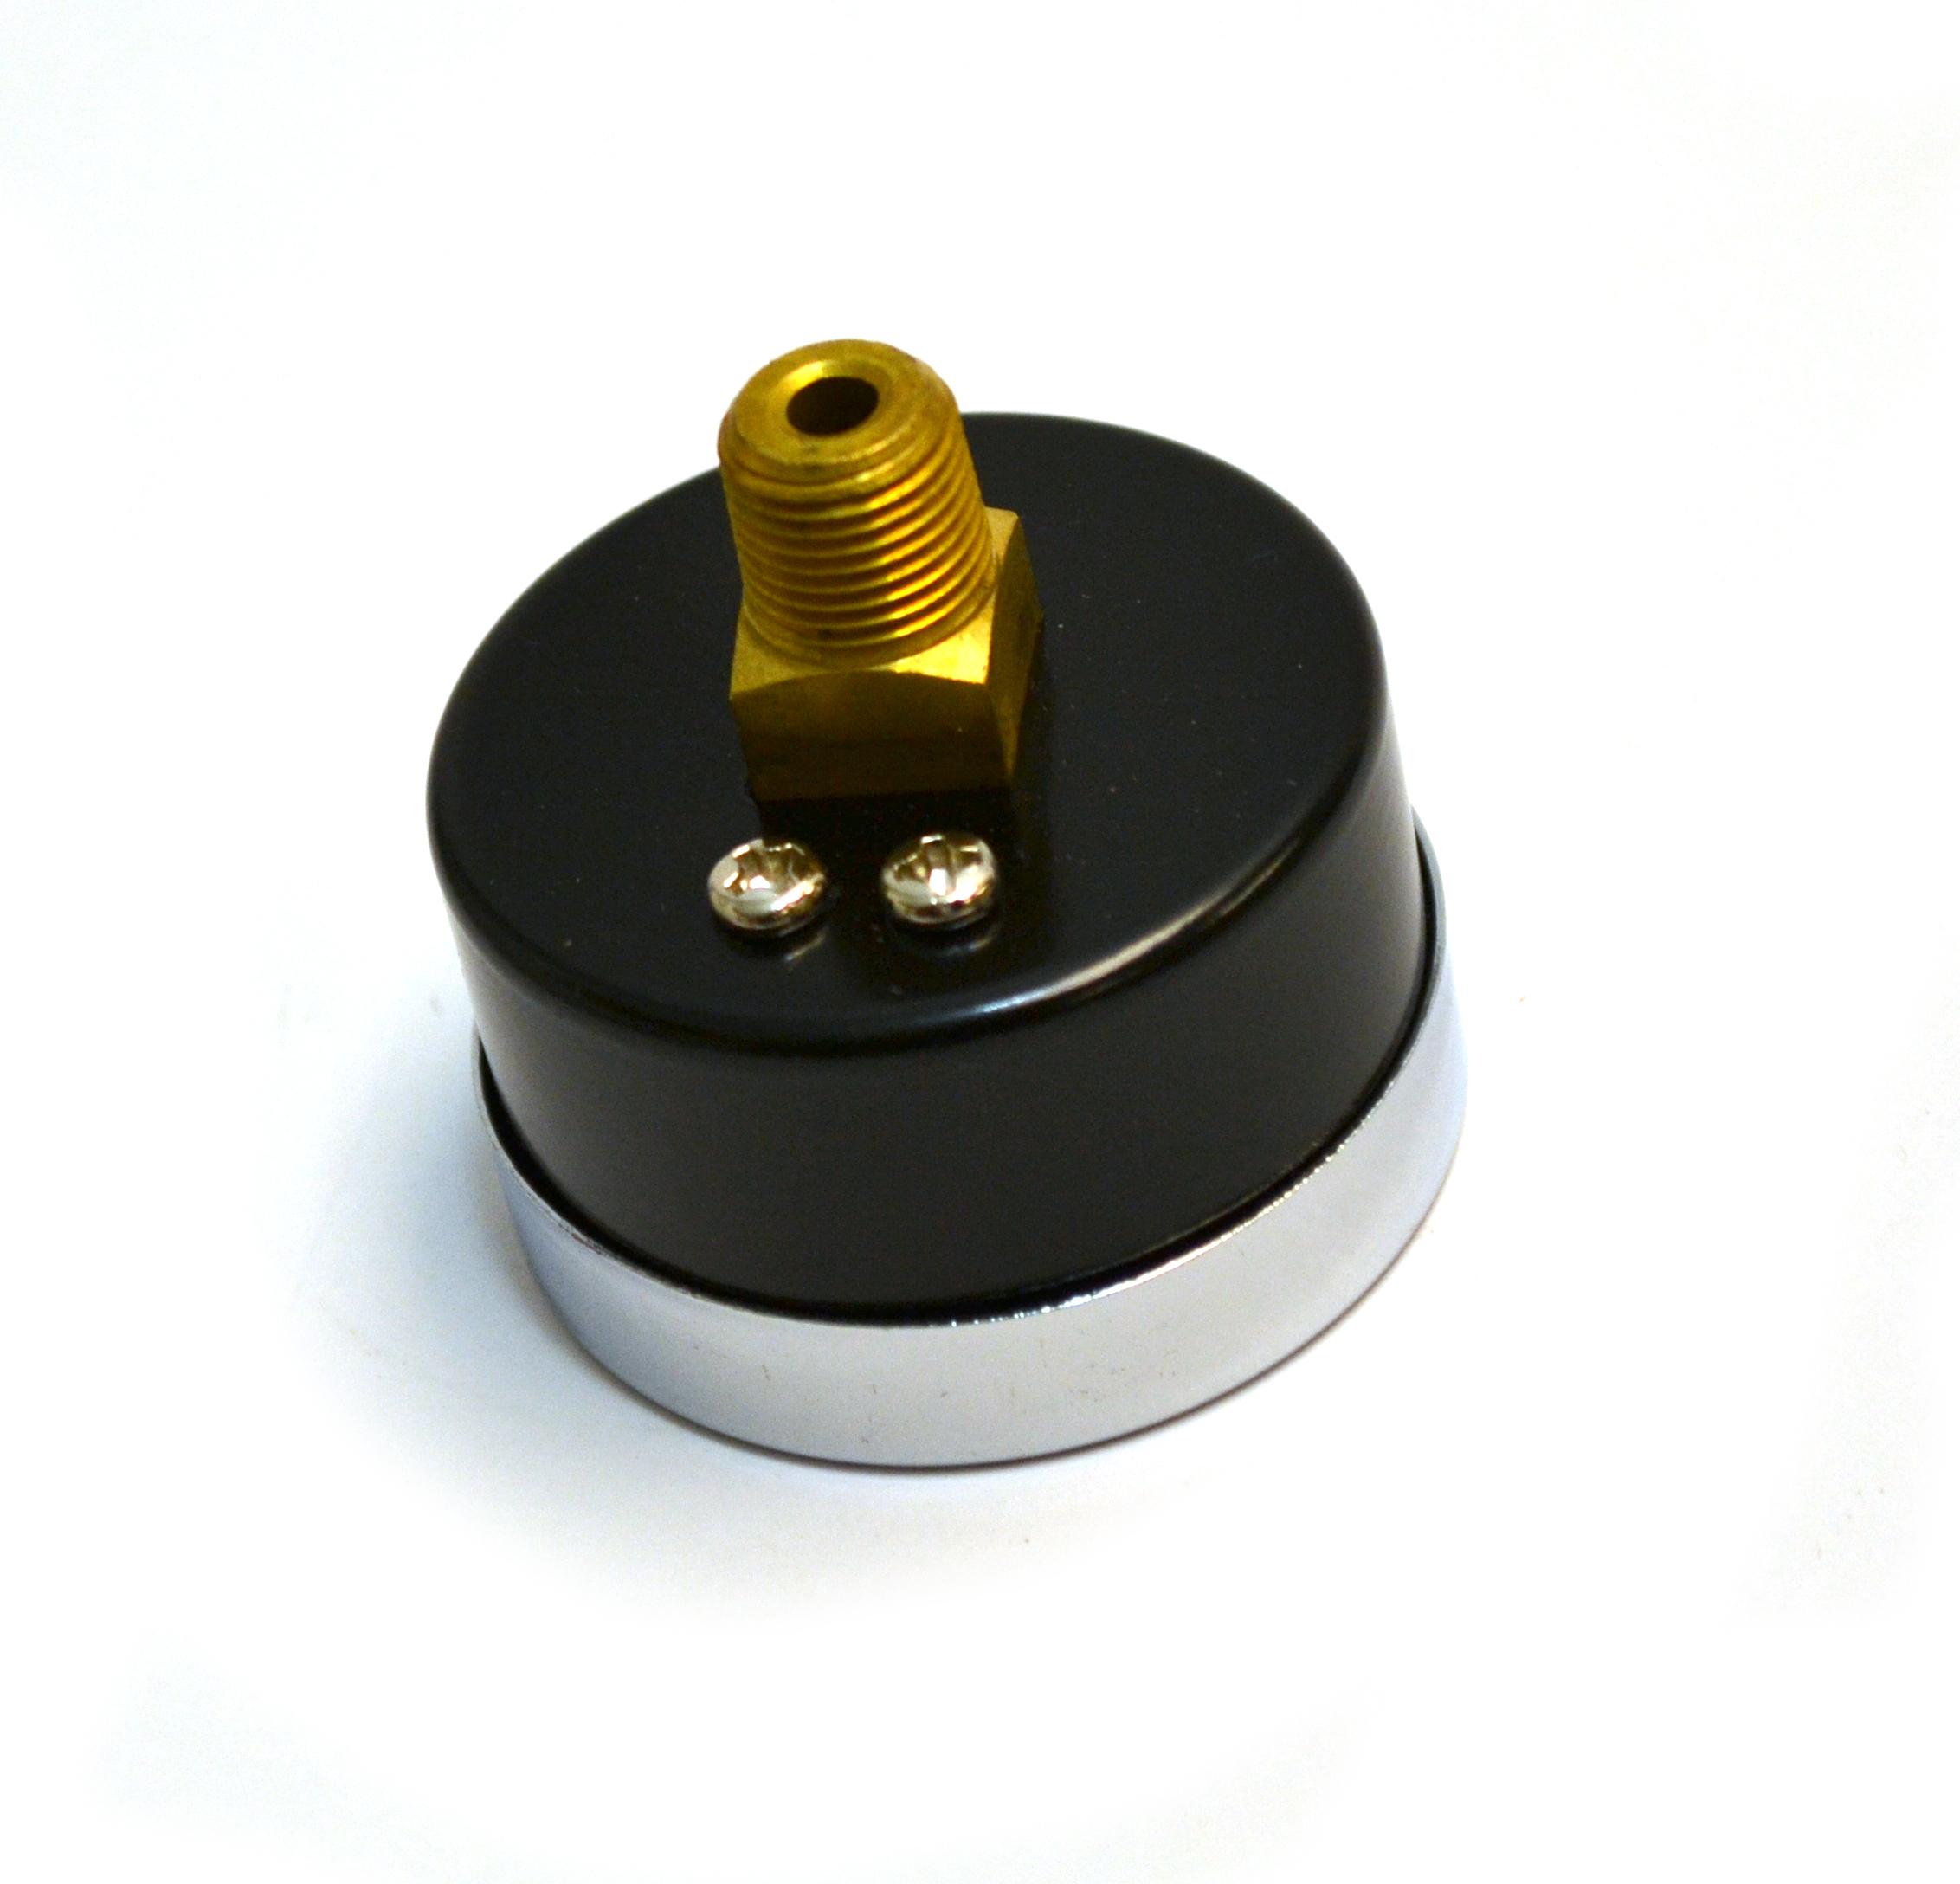 // Groz 60635 Pressure Gauge 1//8 NPT Dual Scale PSI//bar 5/% Back Mount 0-14 PSI Range